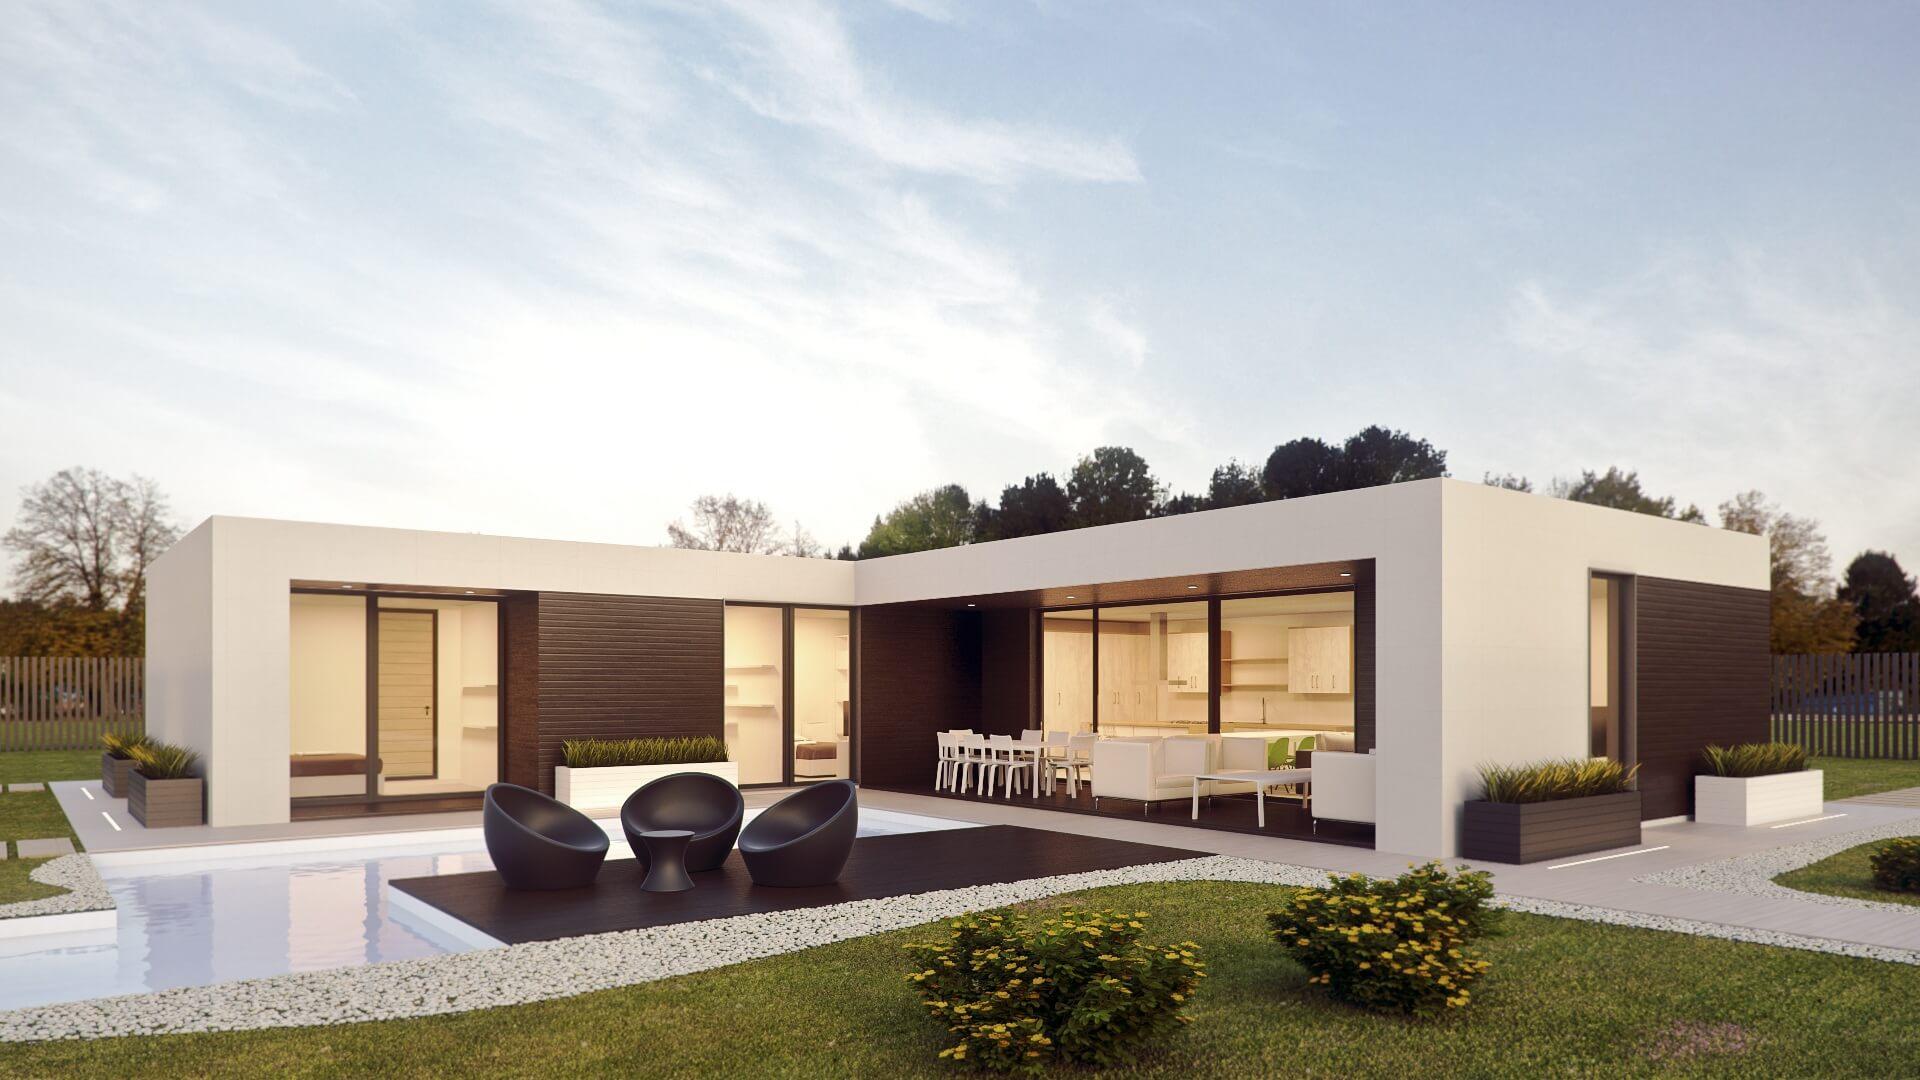 Some Current Interior Design Trendsu2026